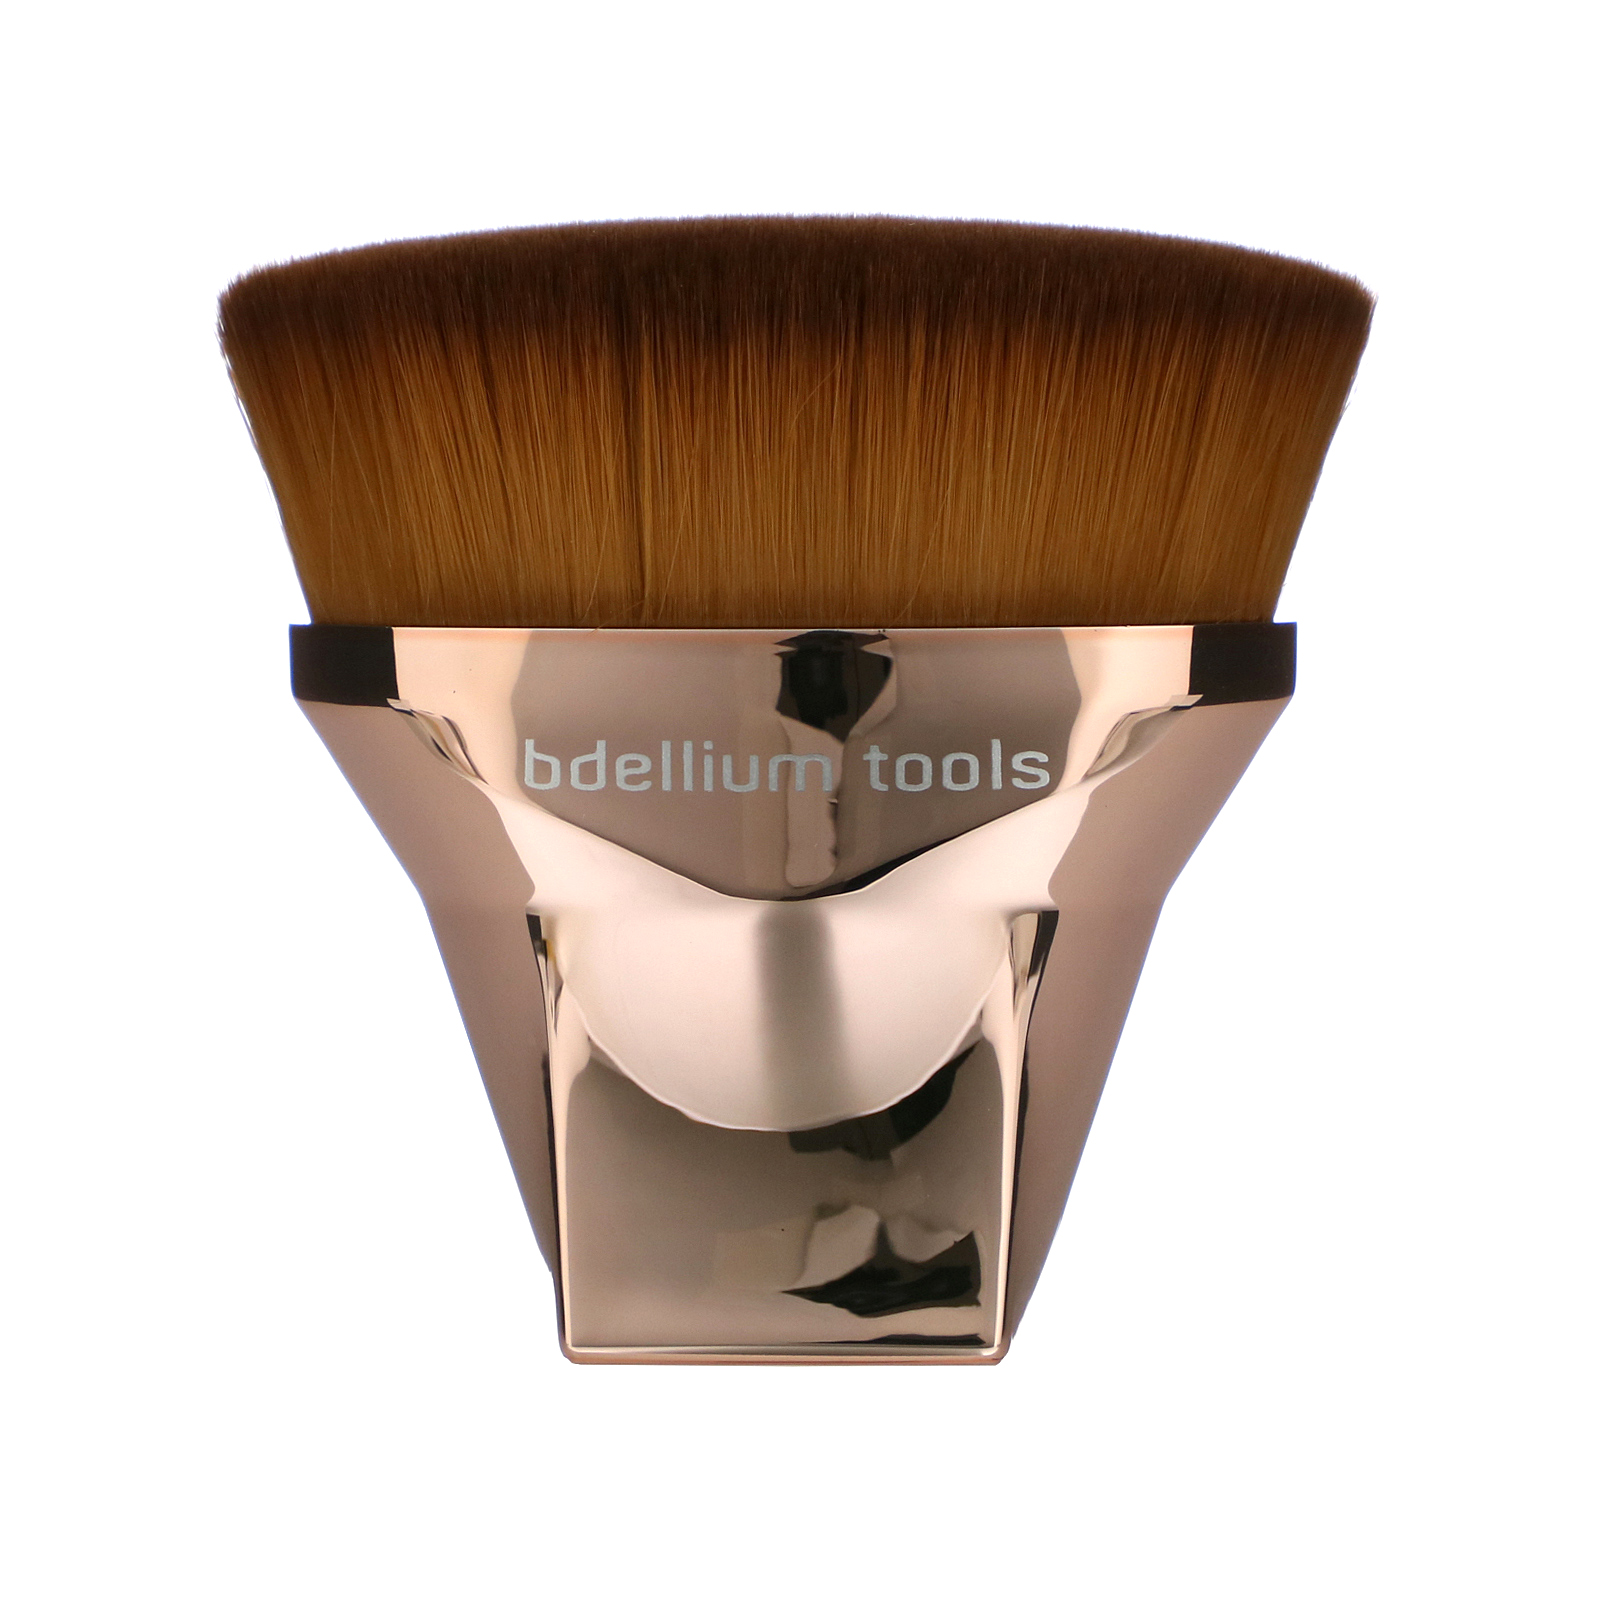 Bdellium Tools, 999 Master Blender, 1 Brush